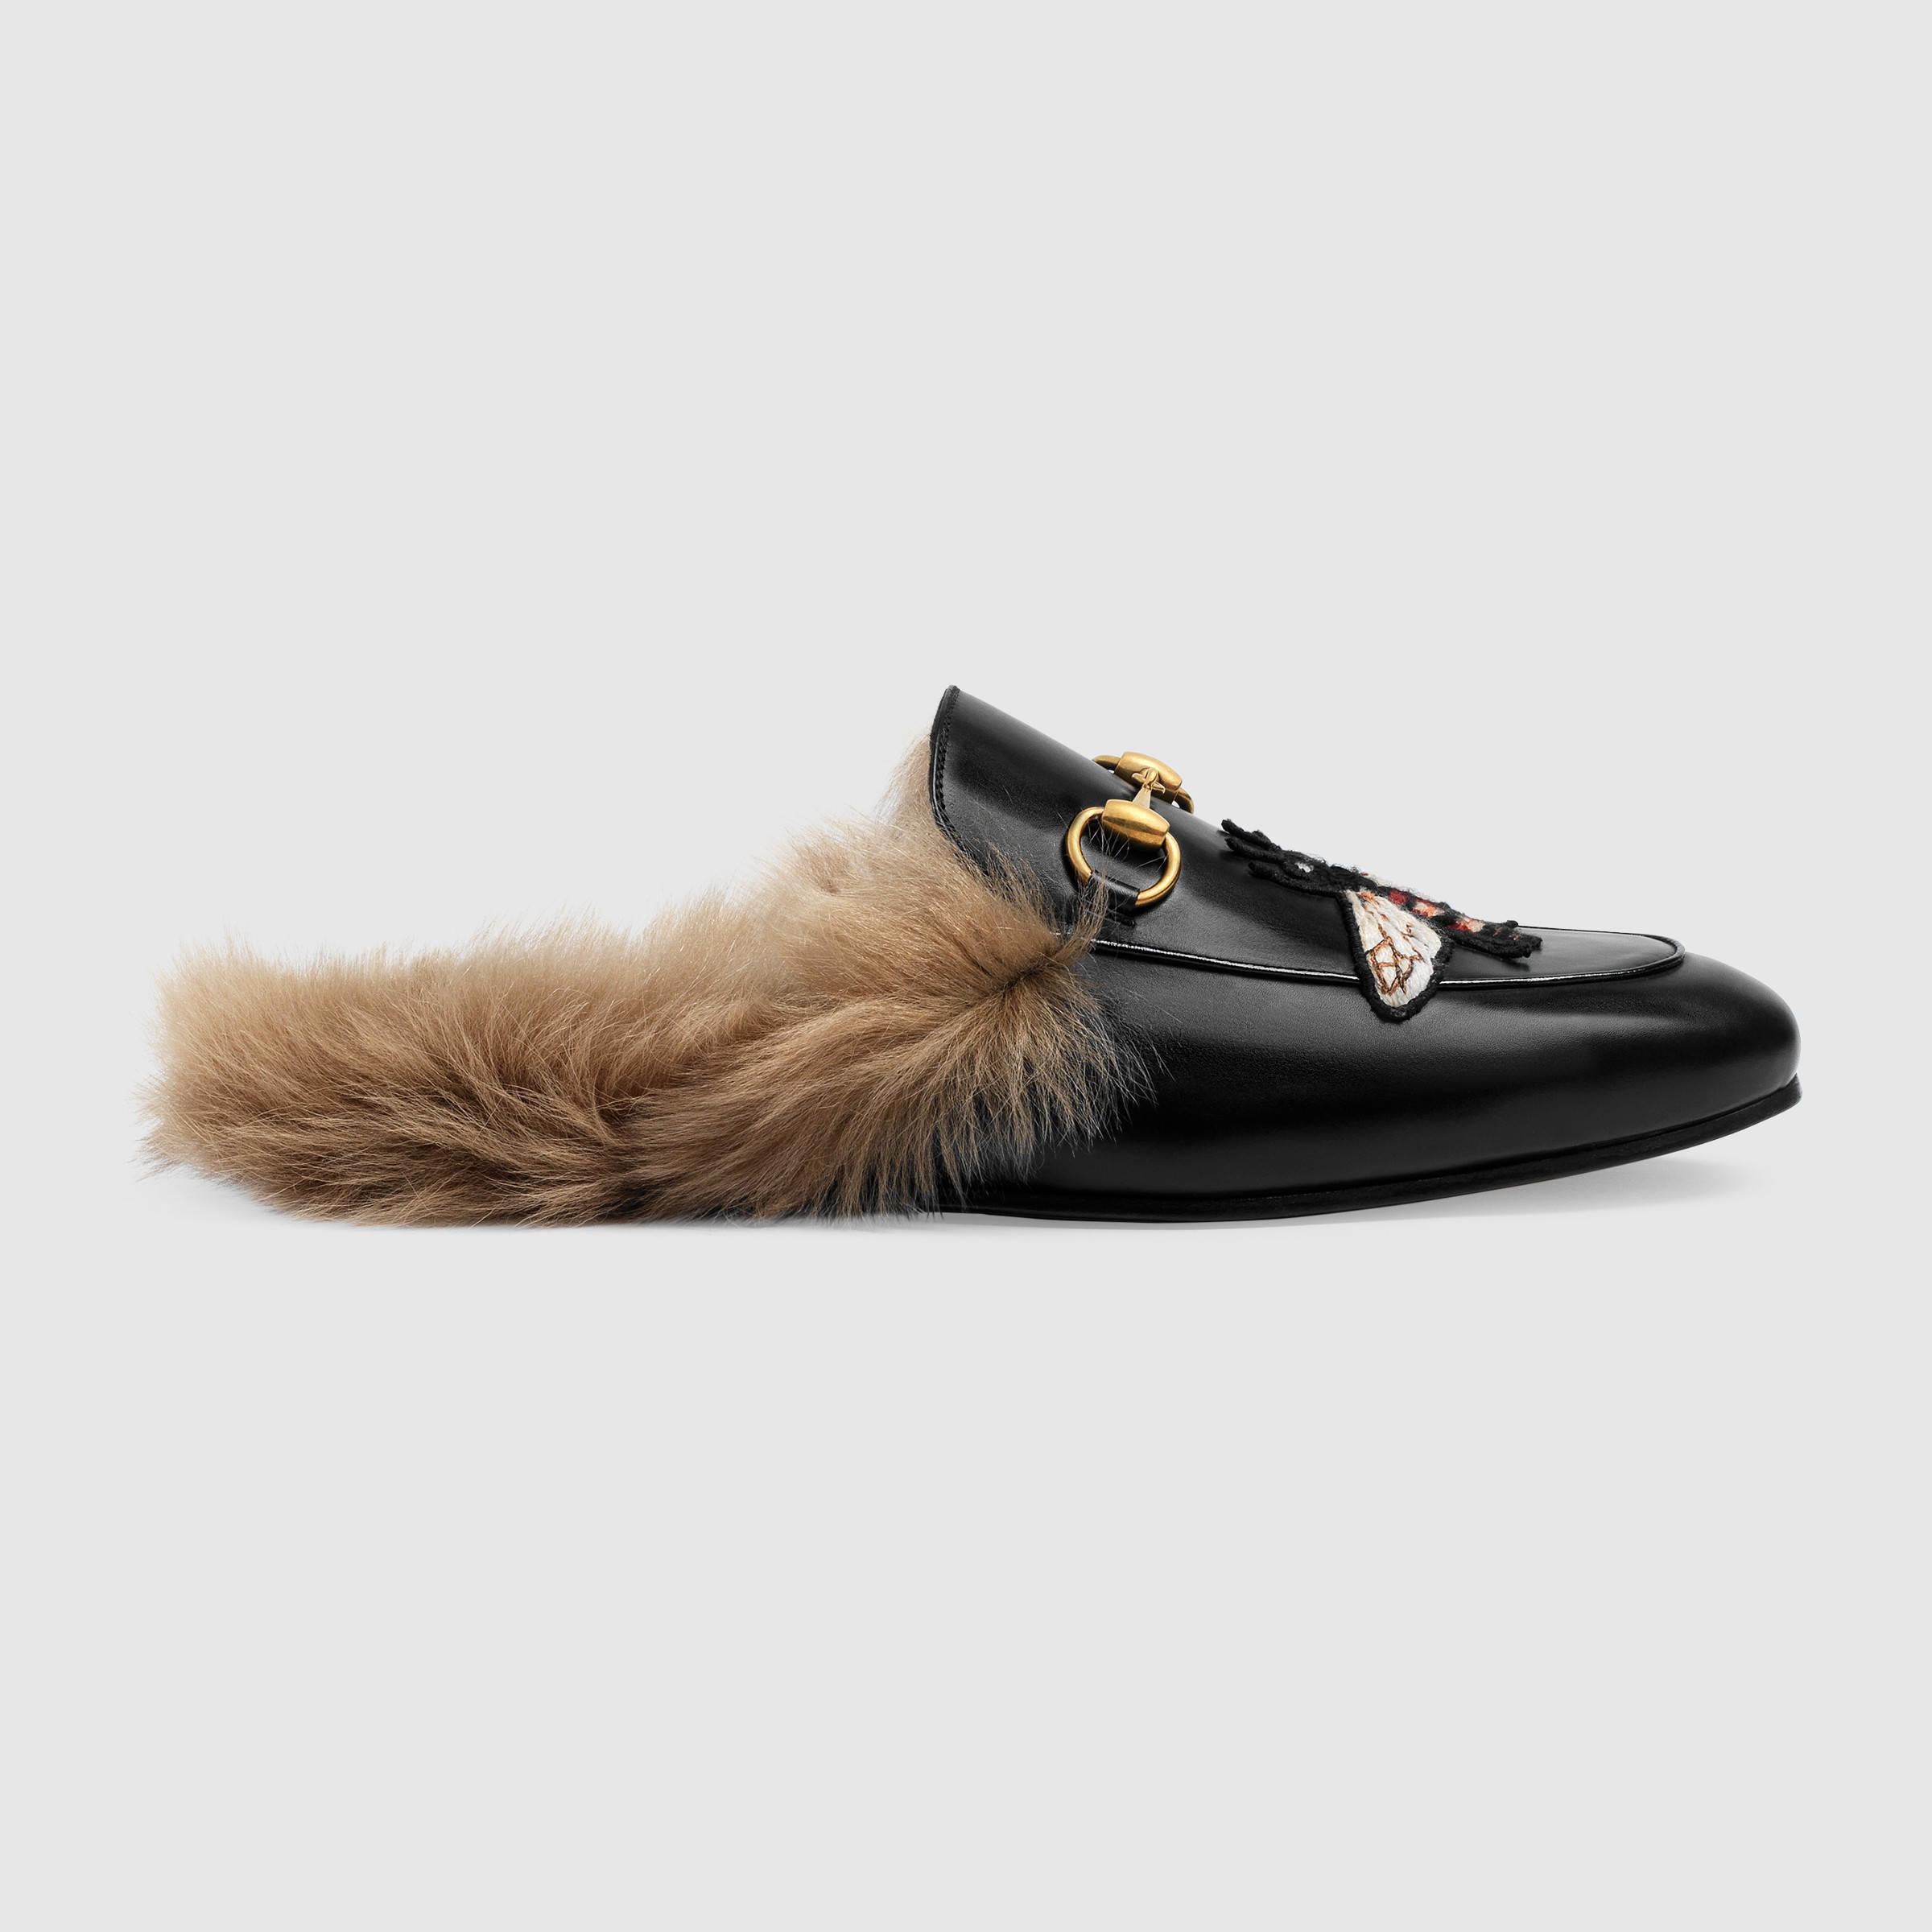 Gucci Slip On Dress Shoes